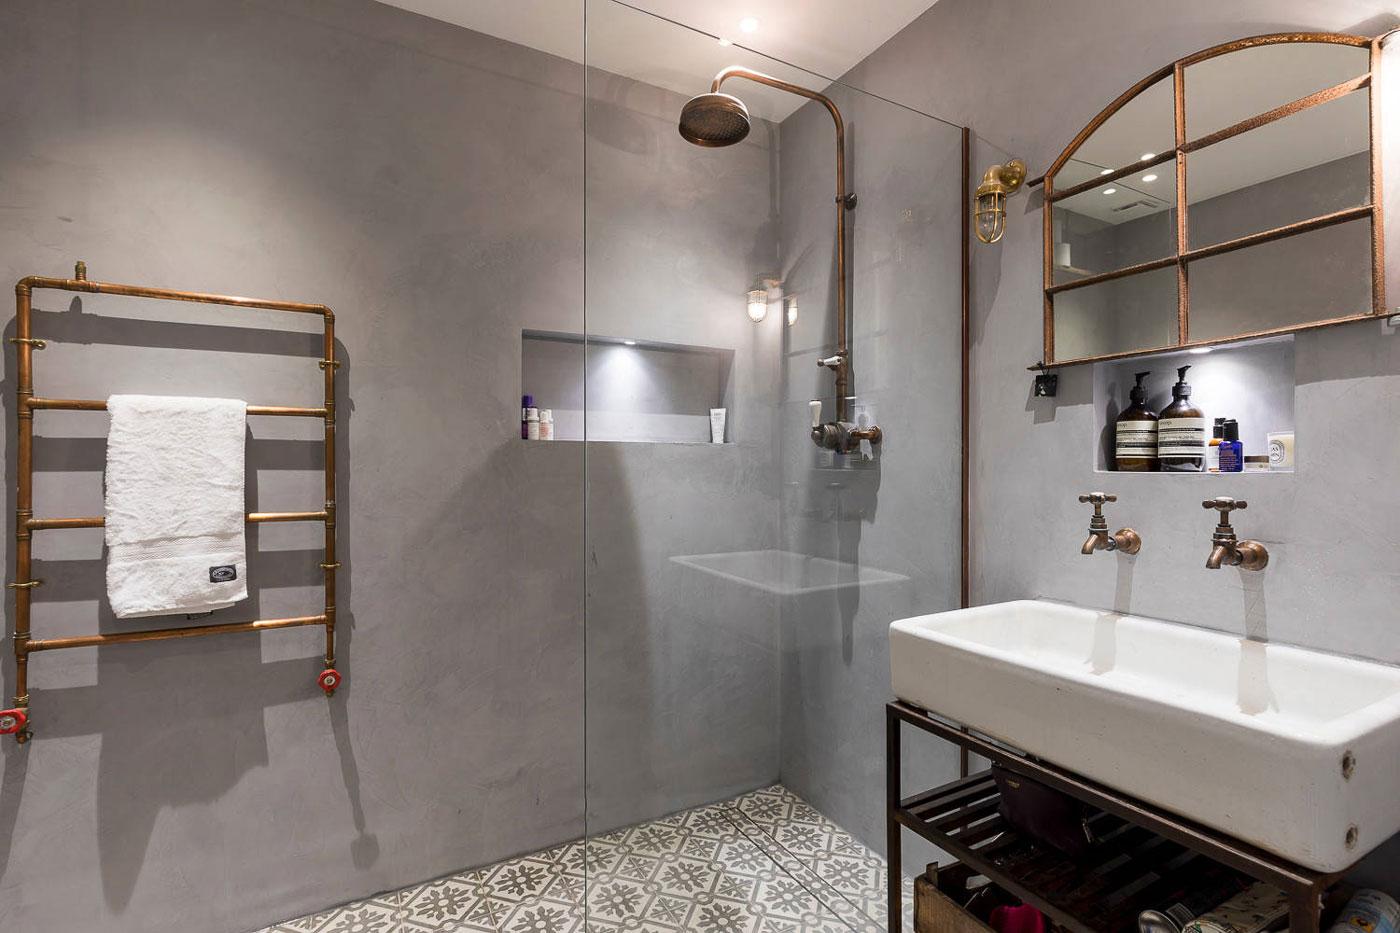 Minimalistic industrial bathroom